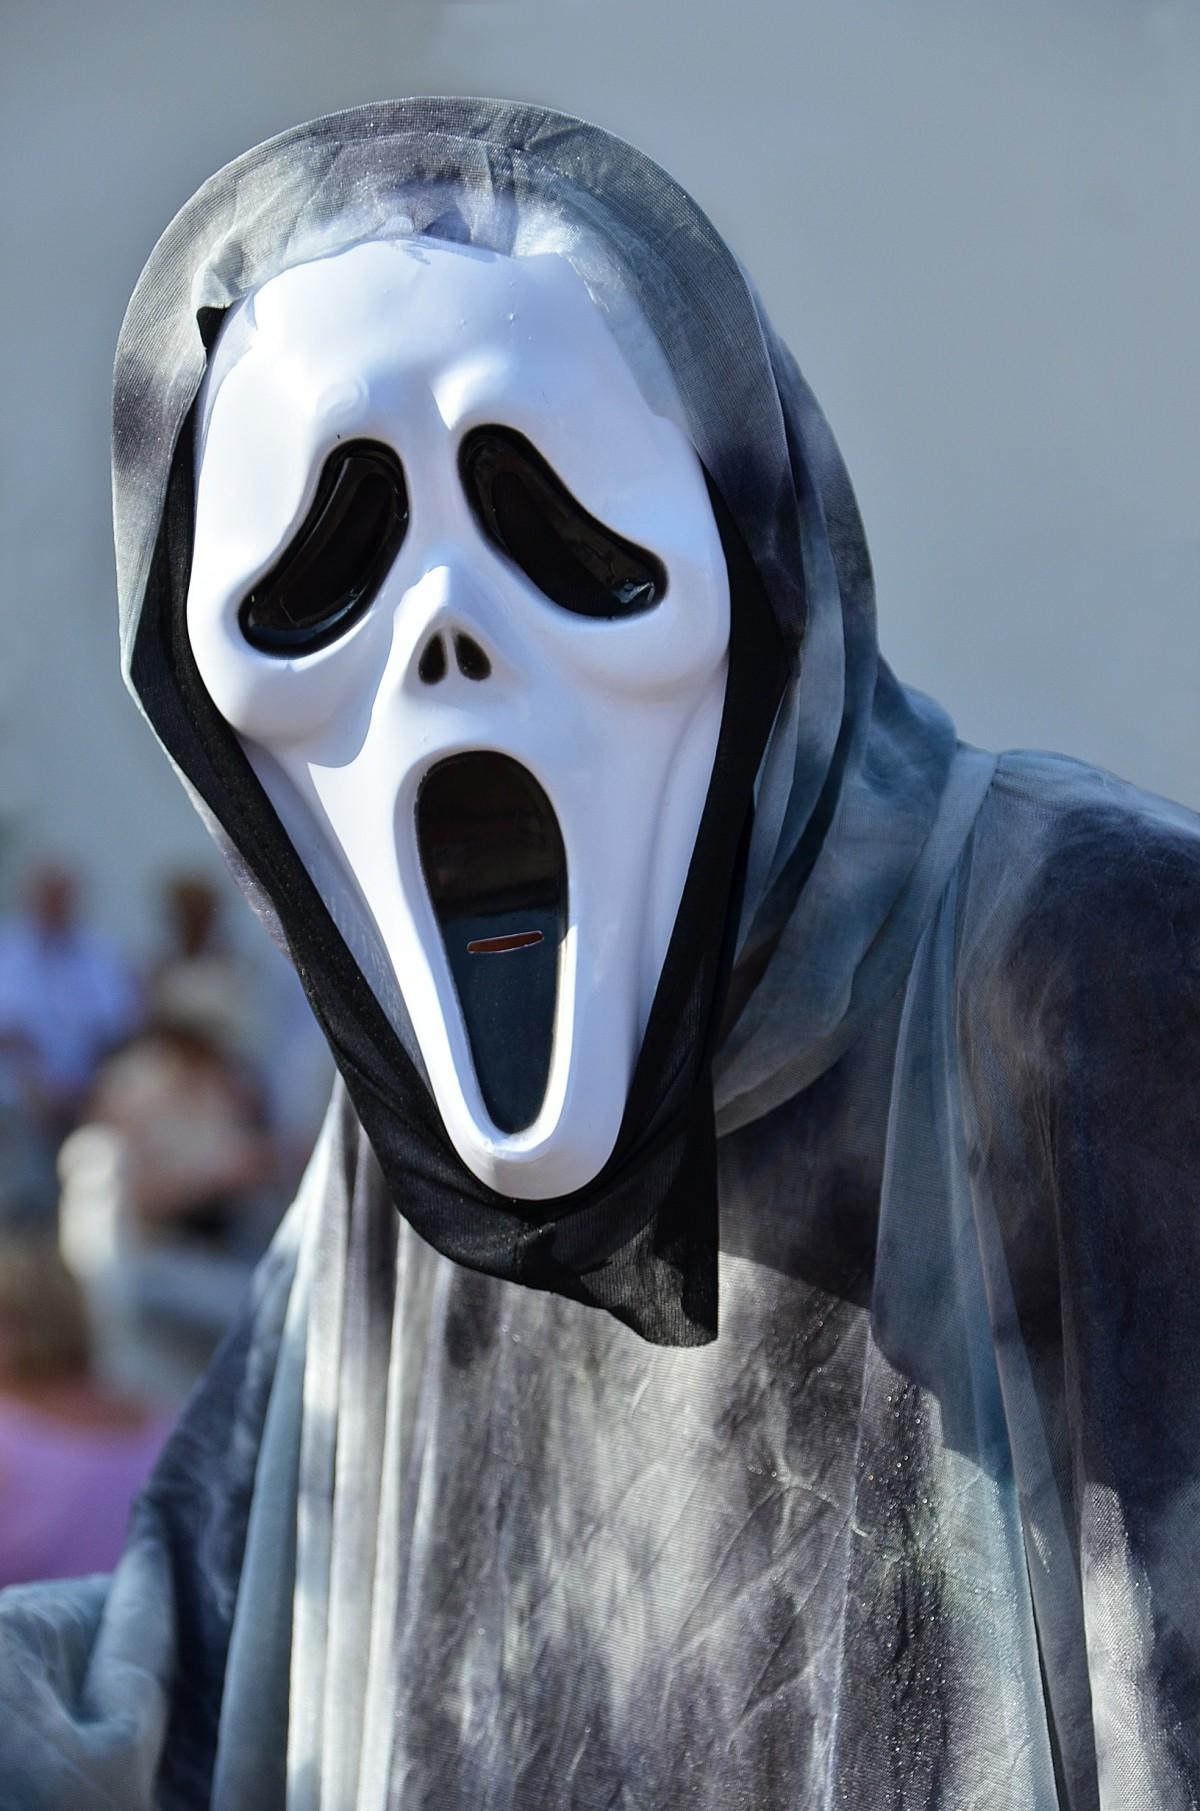 haloween_mask_ghost_fear_skull_yell_film_horror